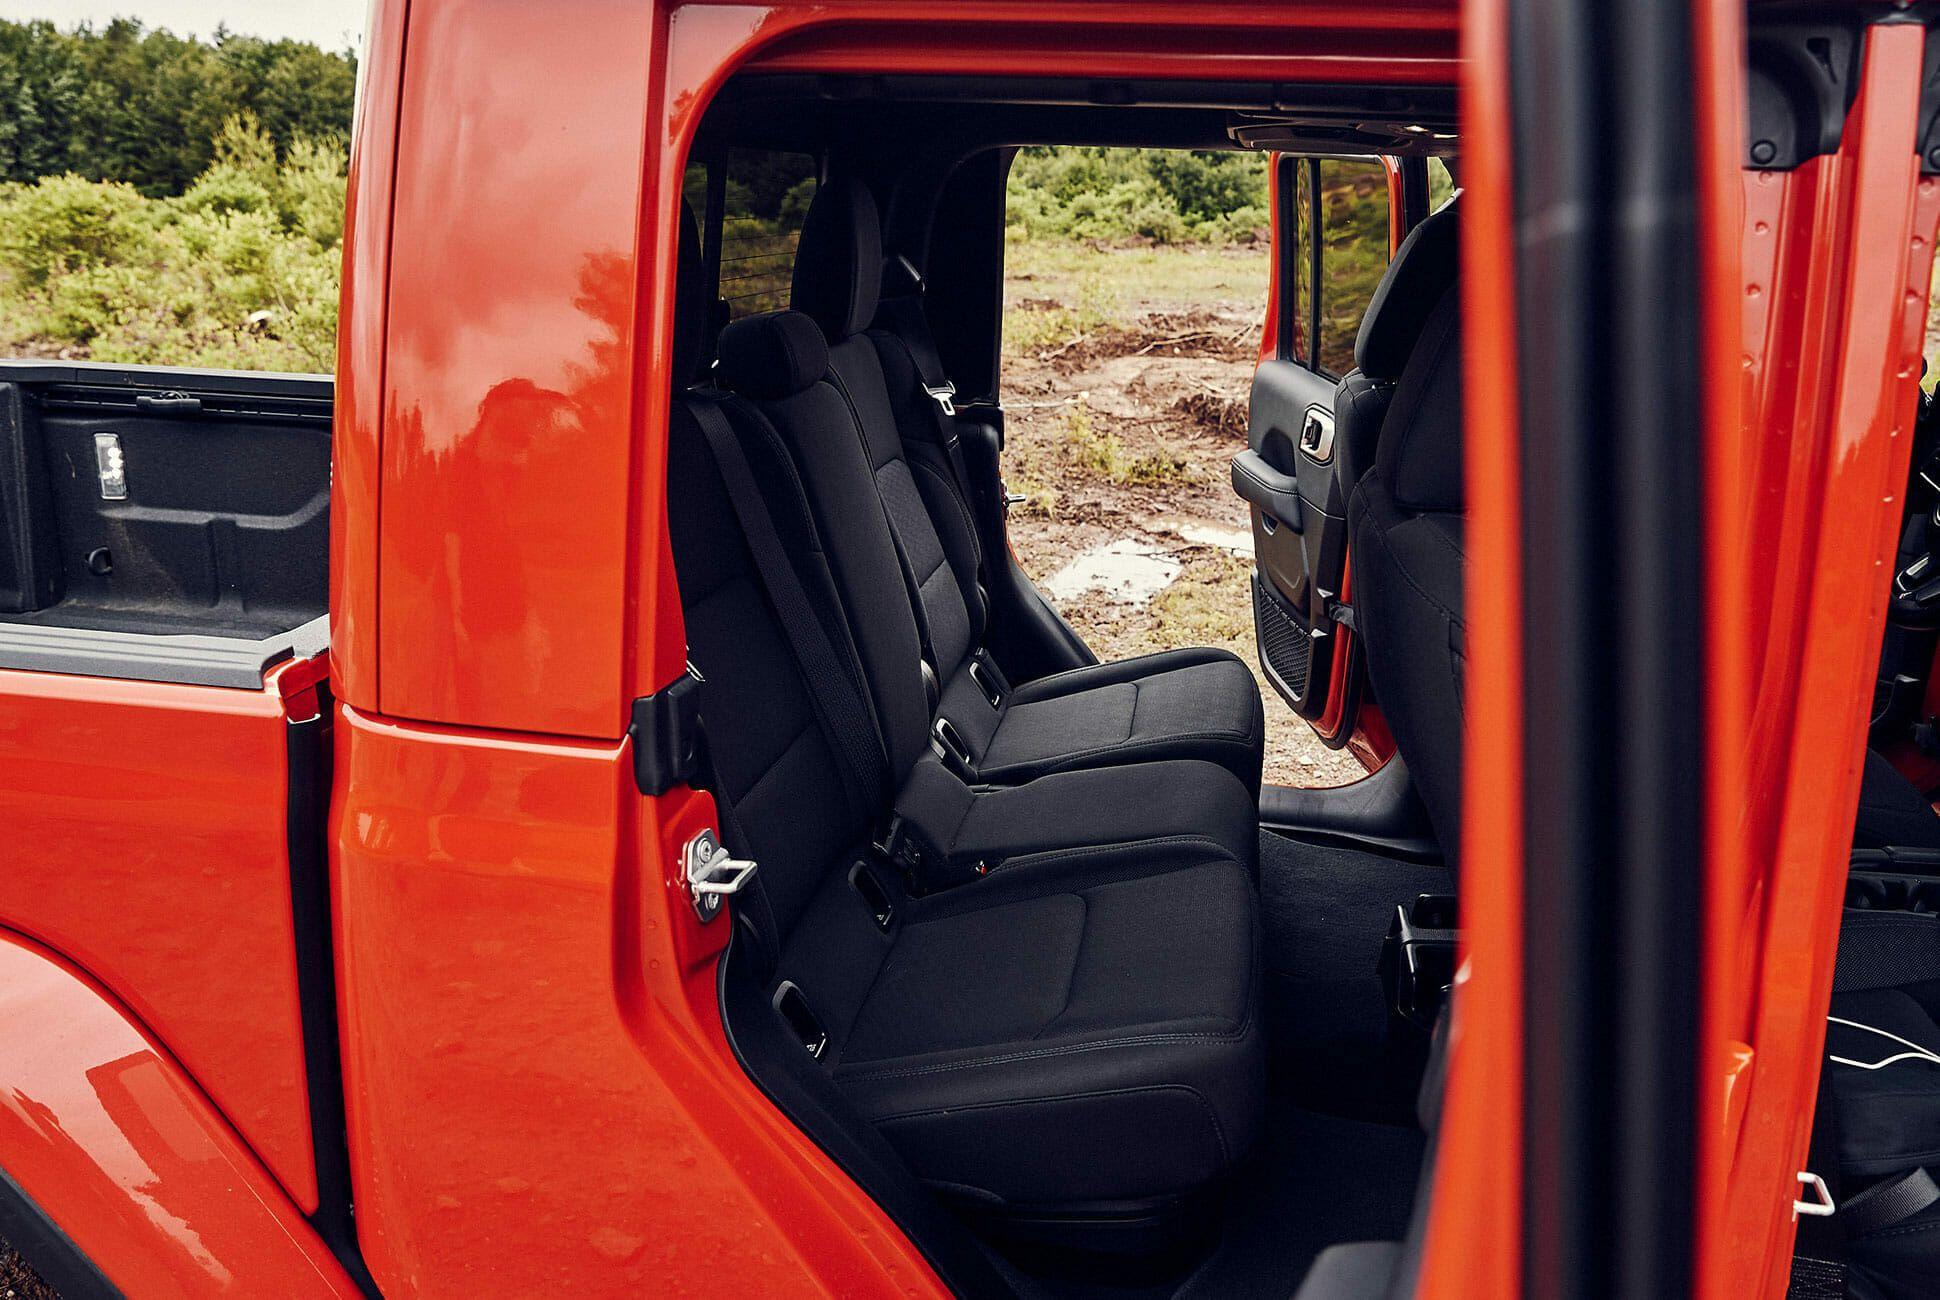 Jeep-Gladiator-Review-Gear-Patrol-slide-6